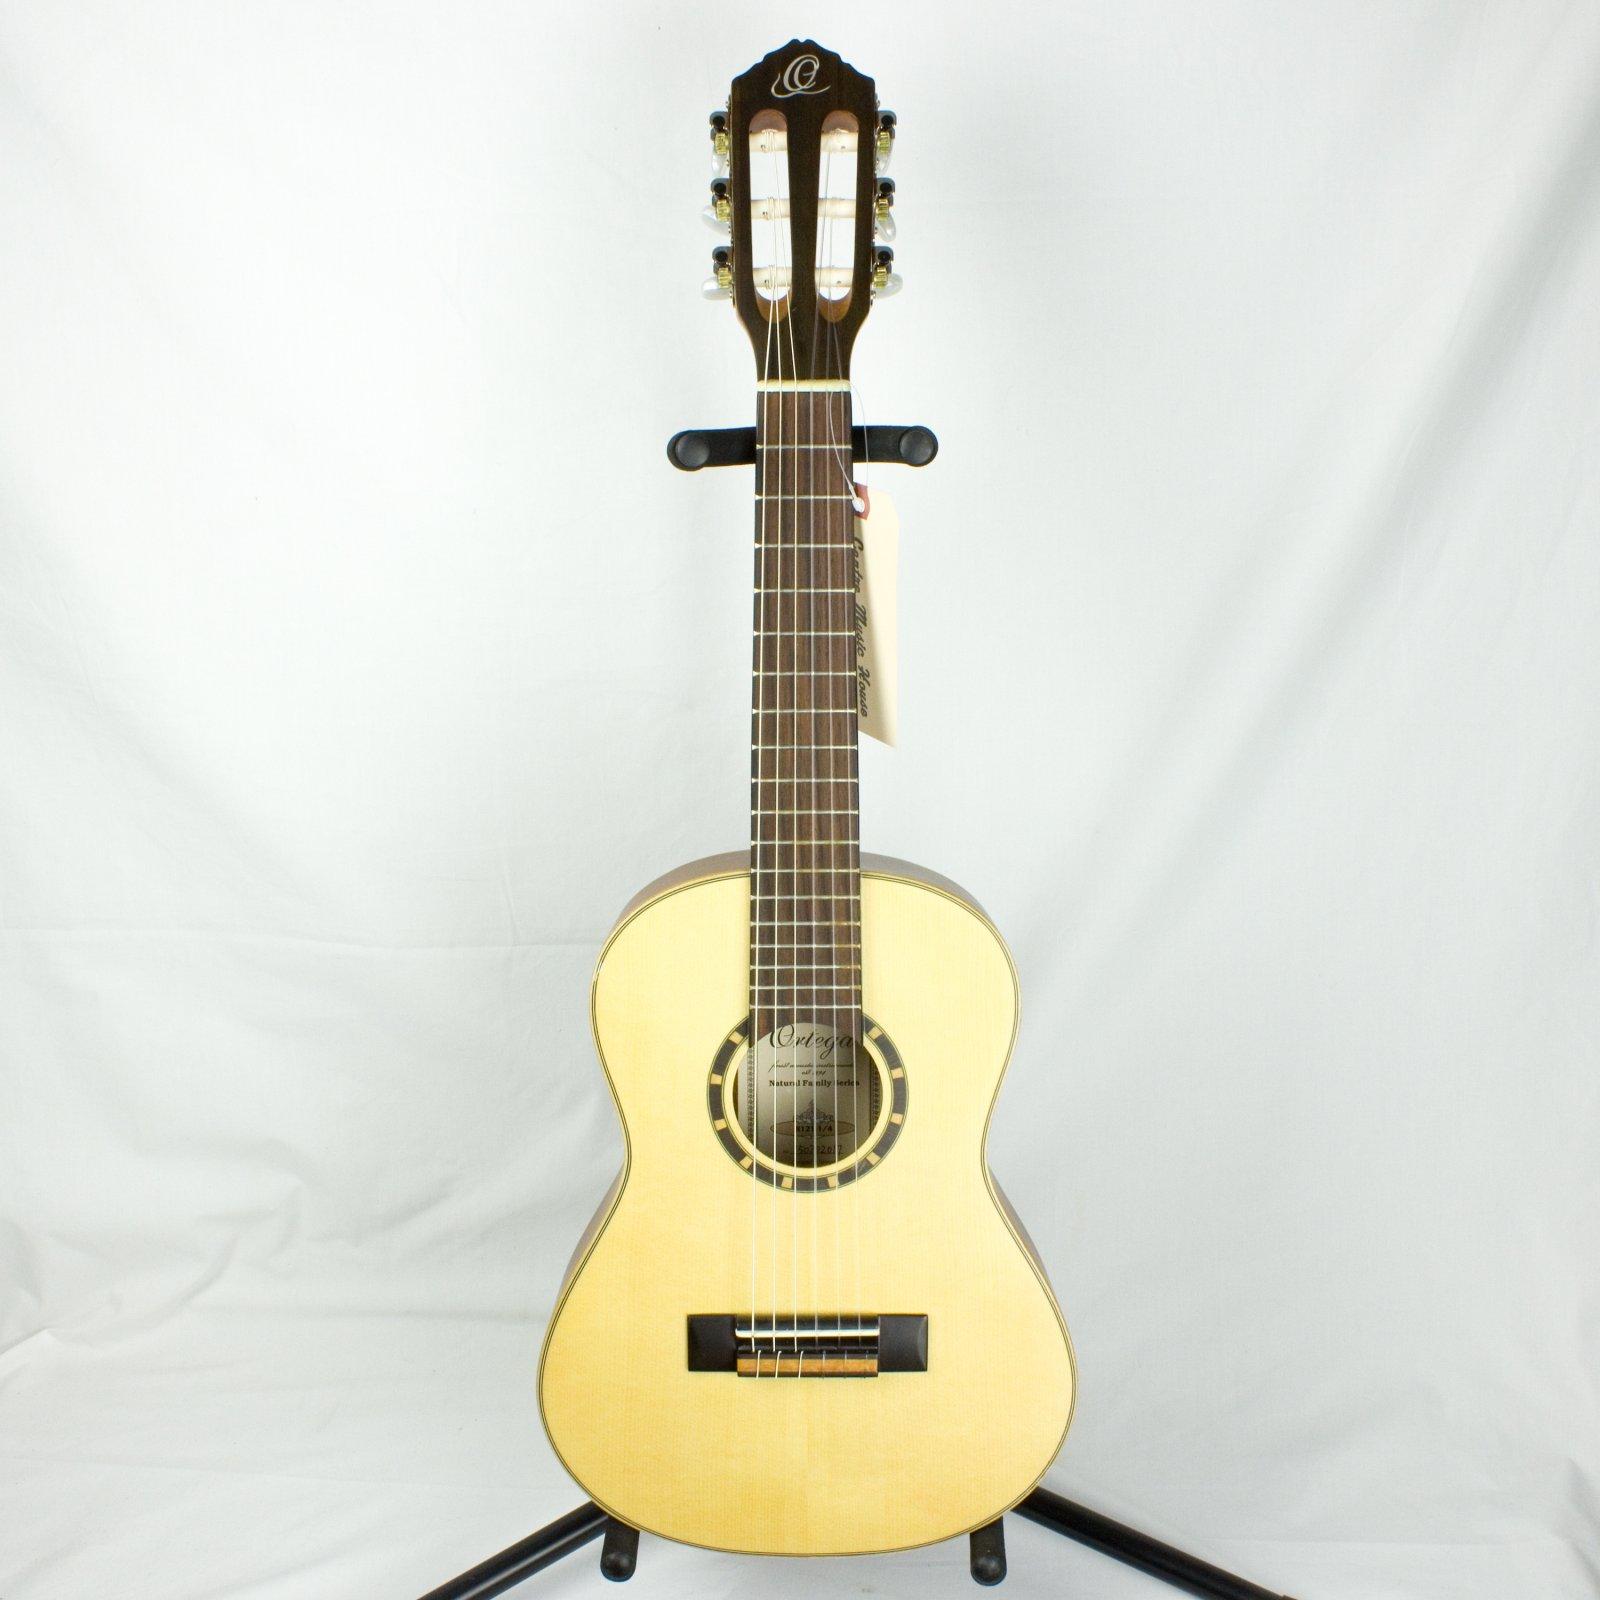 Ortega Family Series R121-1/4 Classical Guitar, 1/4 Size (USED)